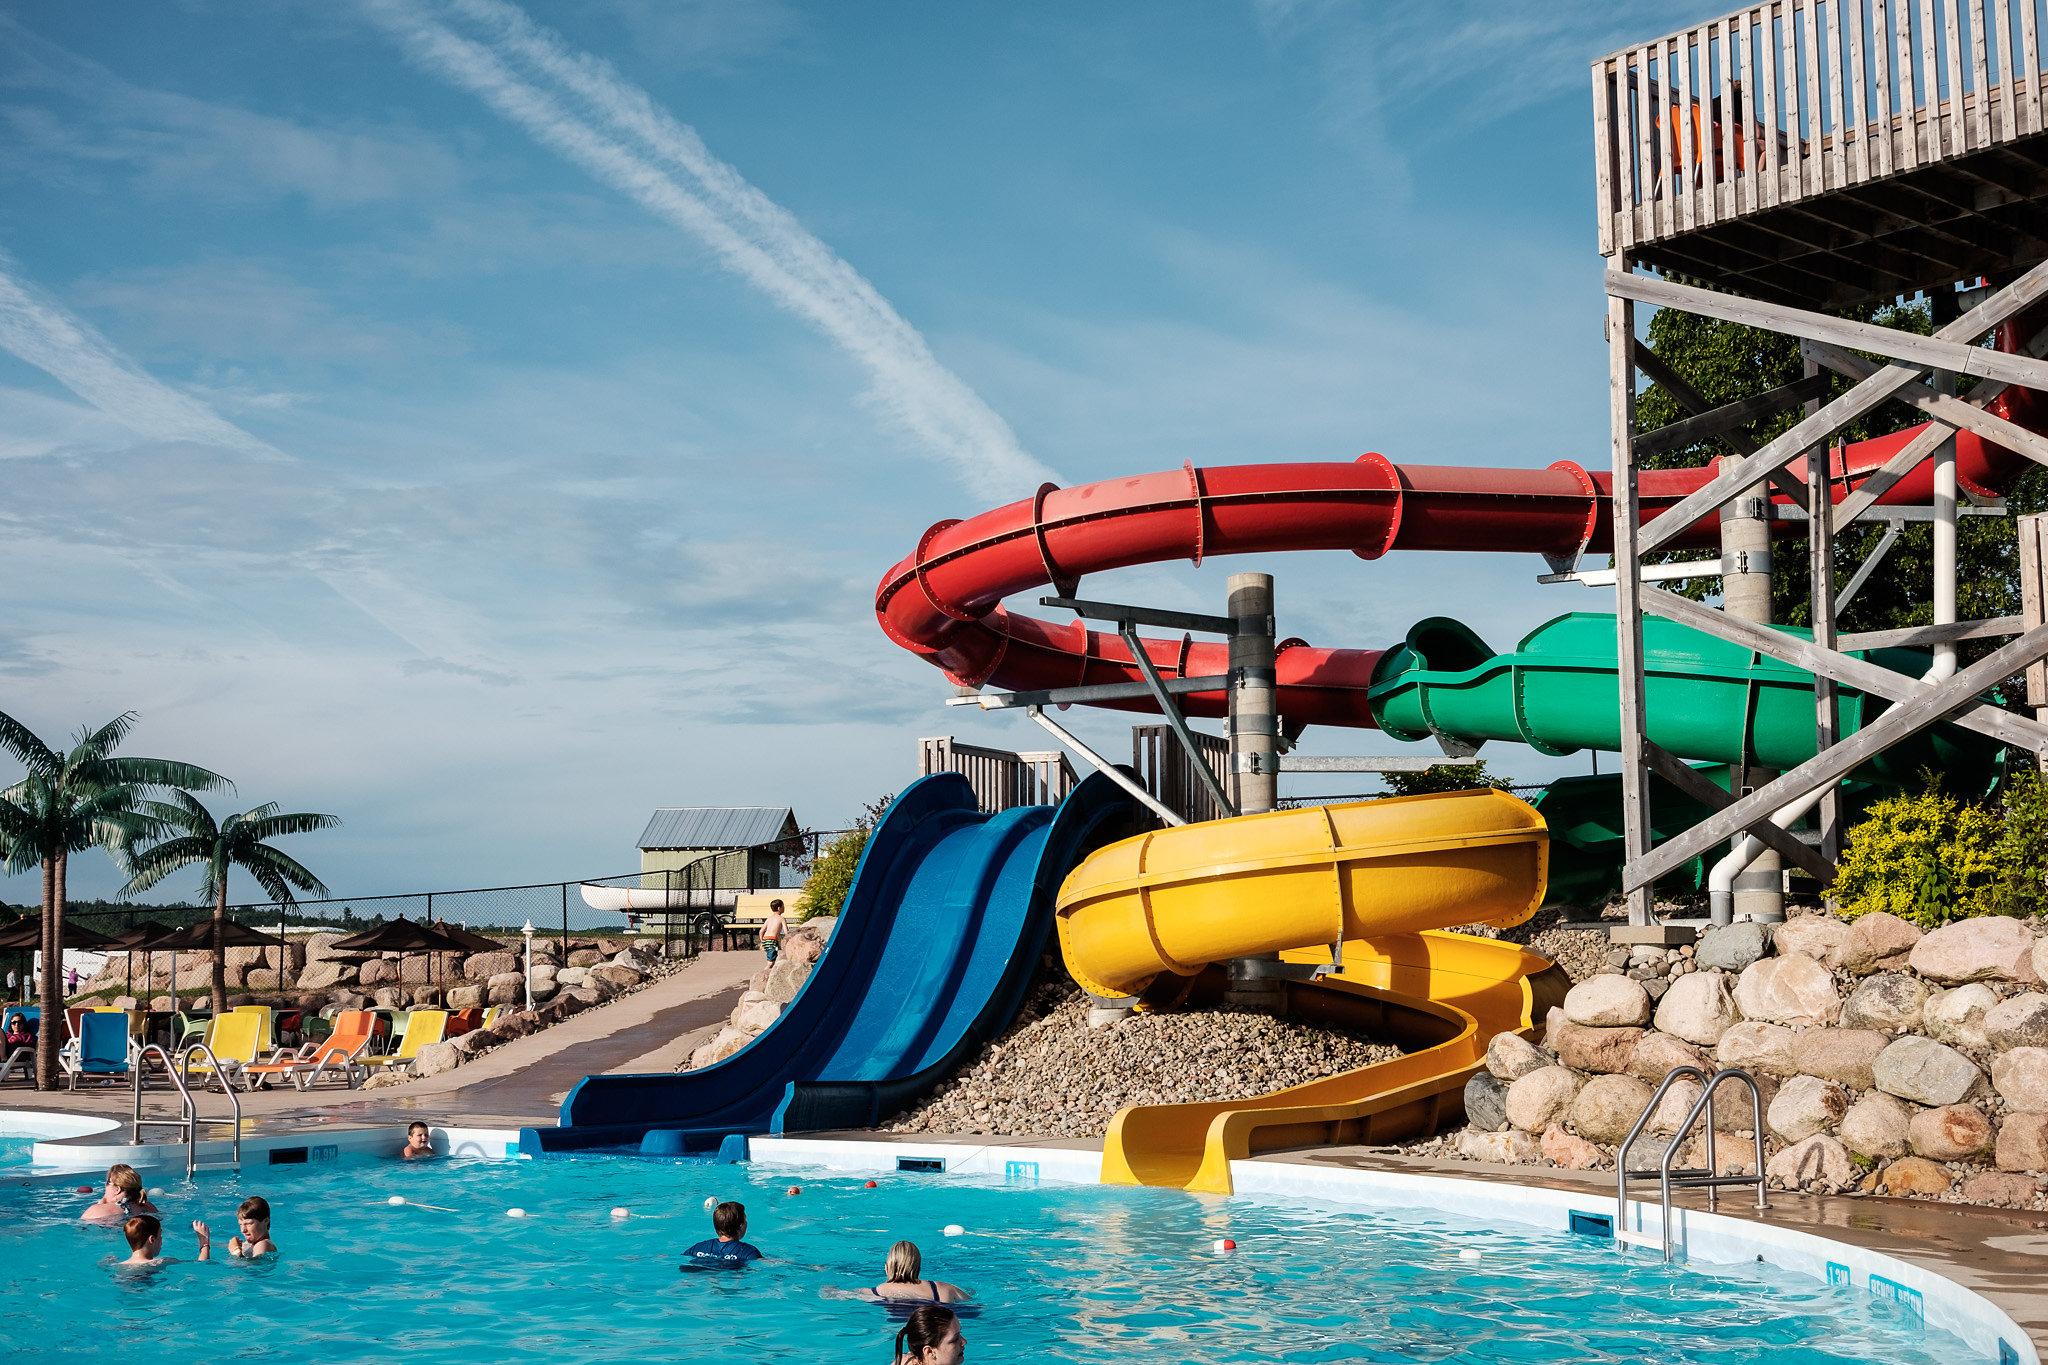 Water Park  Slide into summer fun at Hartt Island!   Let's Make a Splash